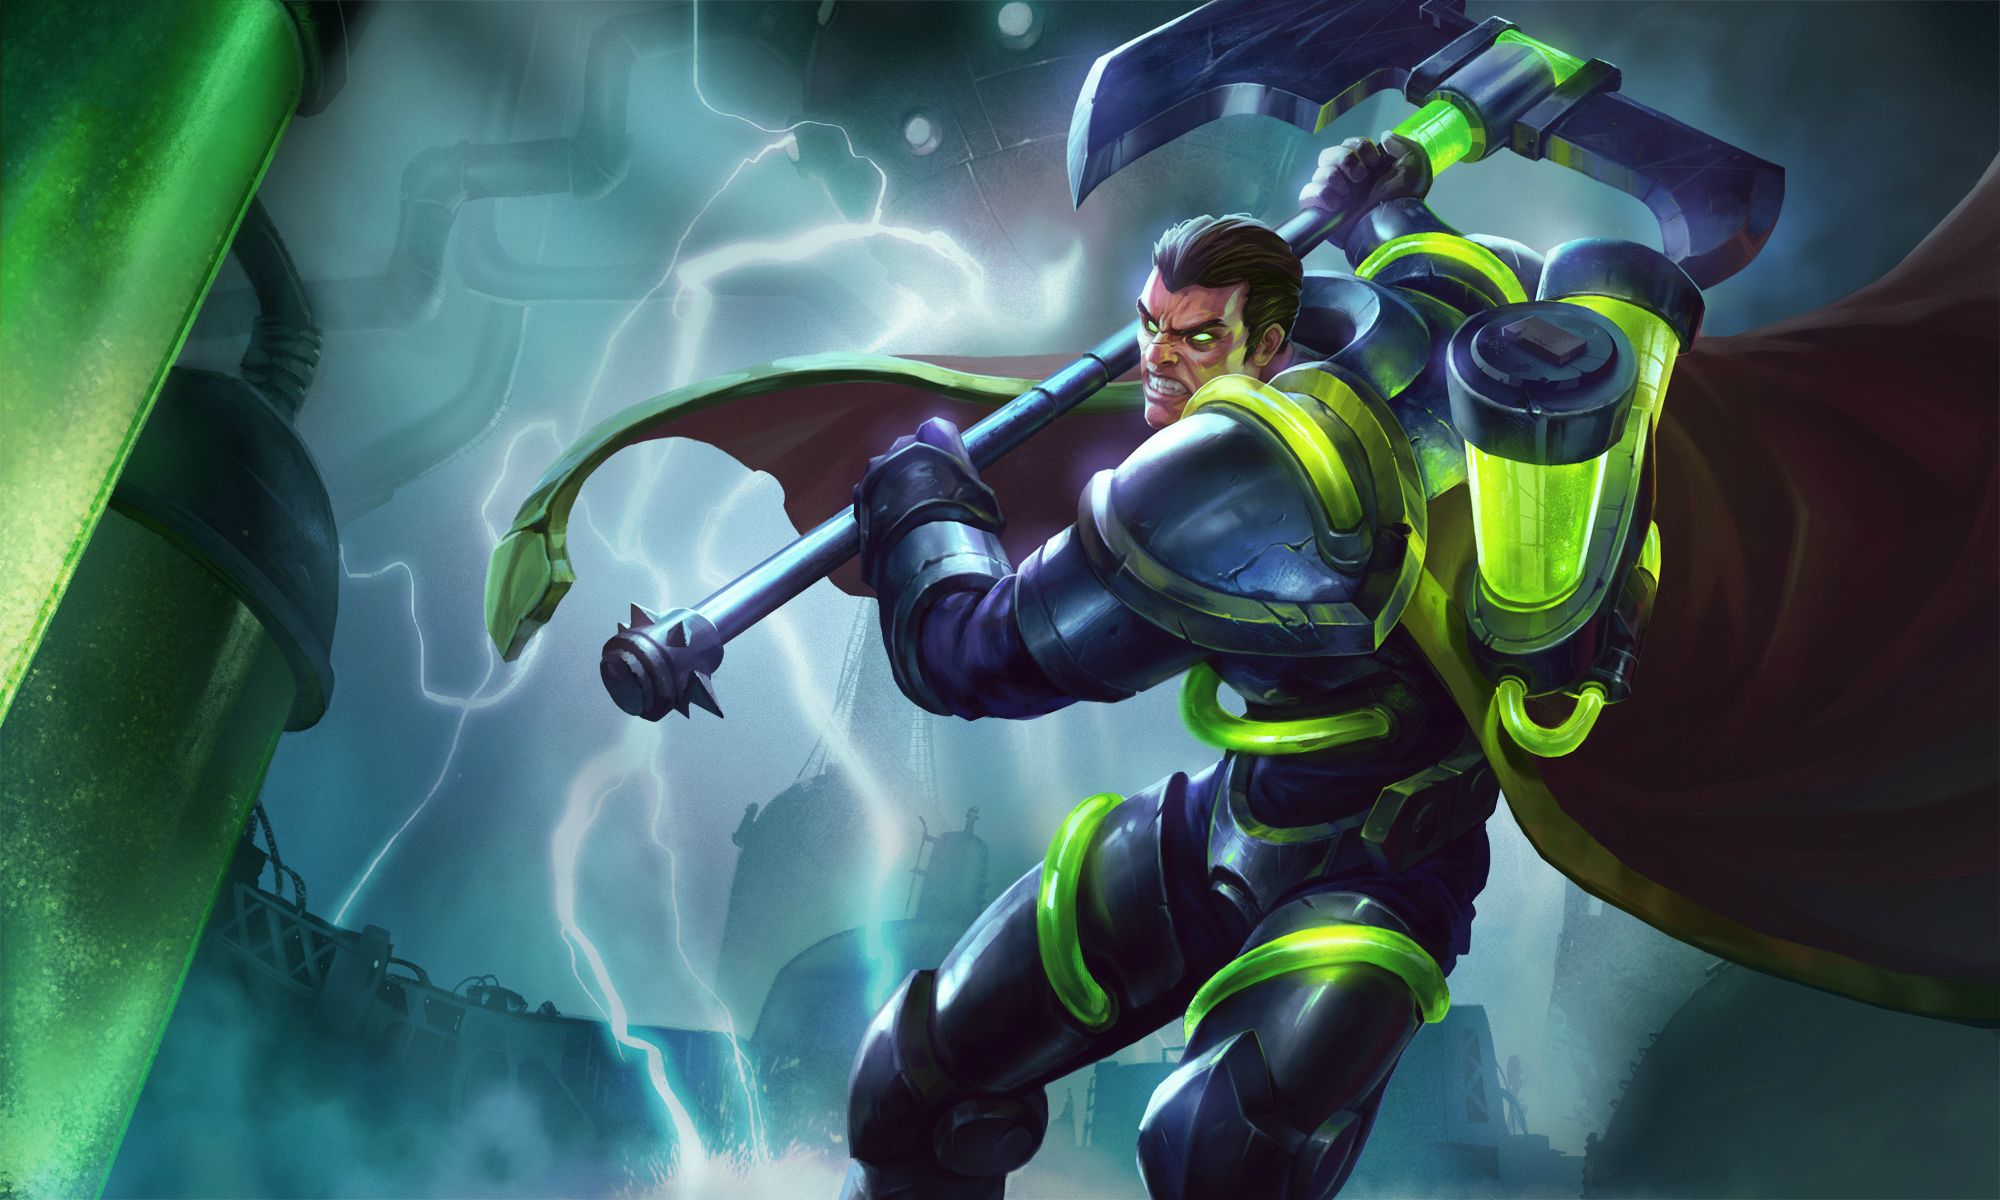 Darius League Of Legends Wallpapers